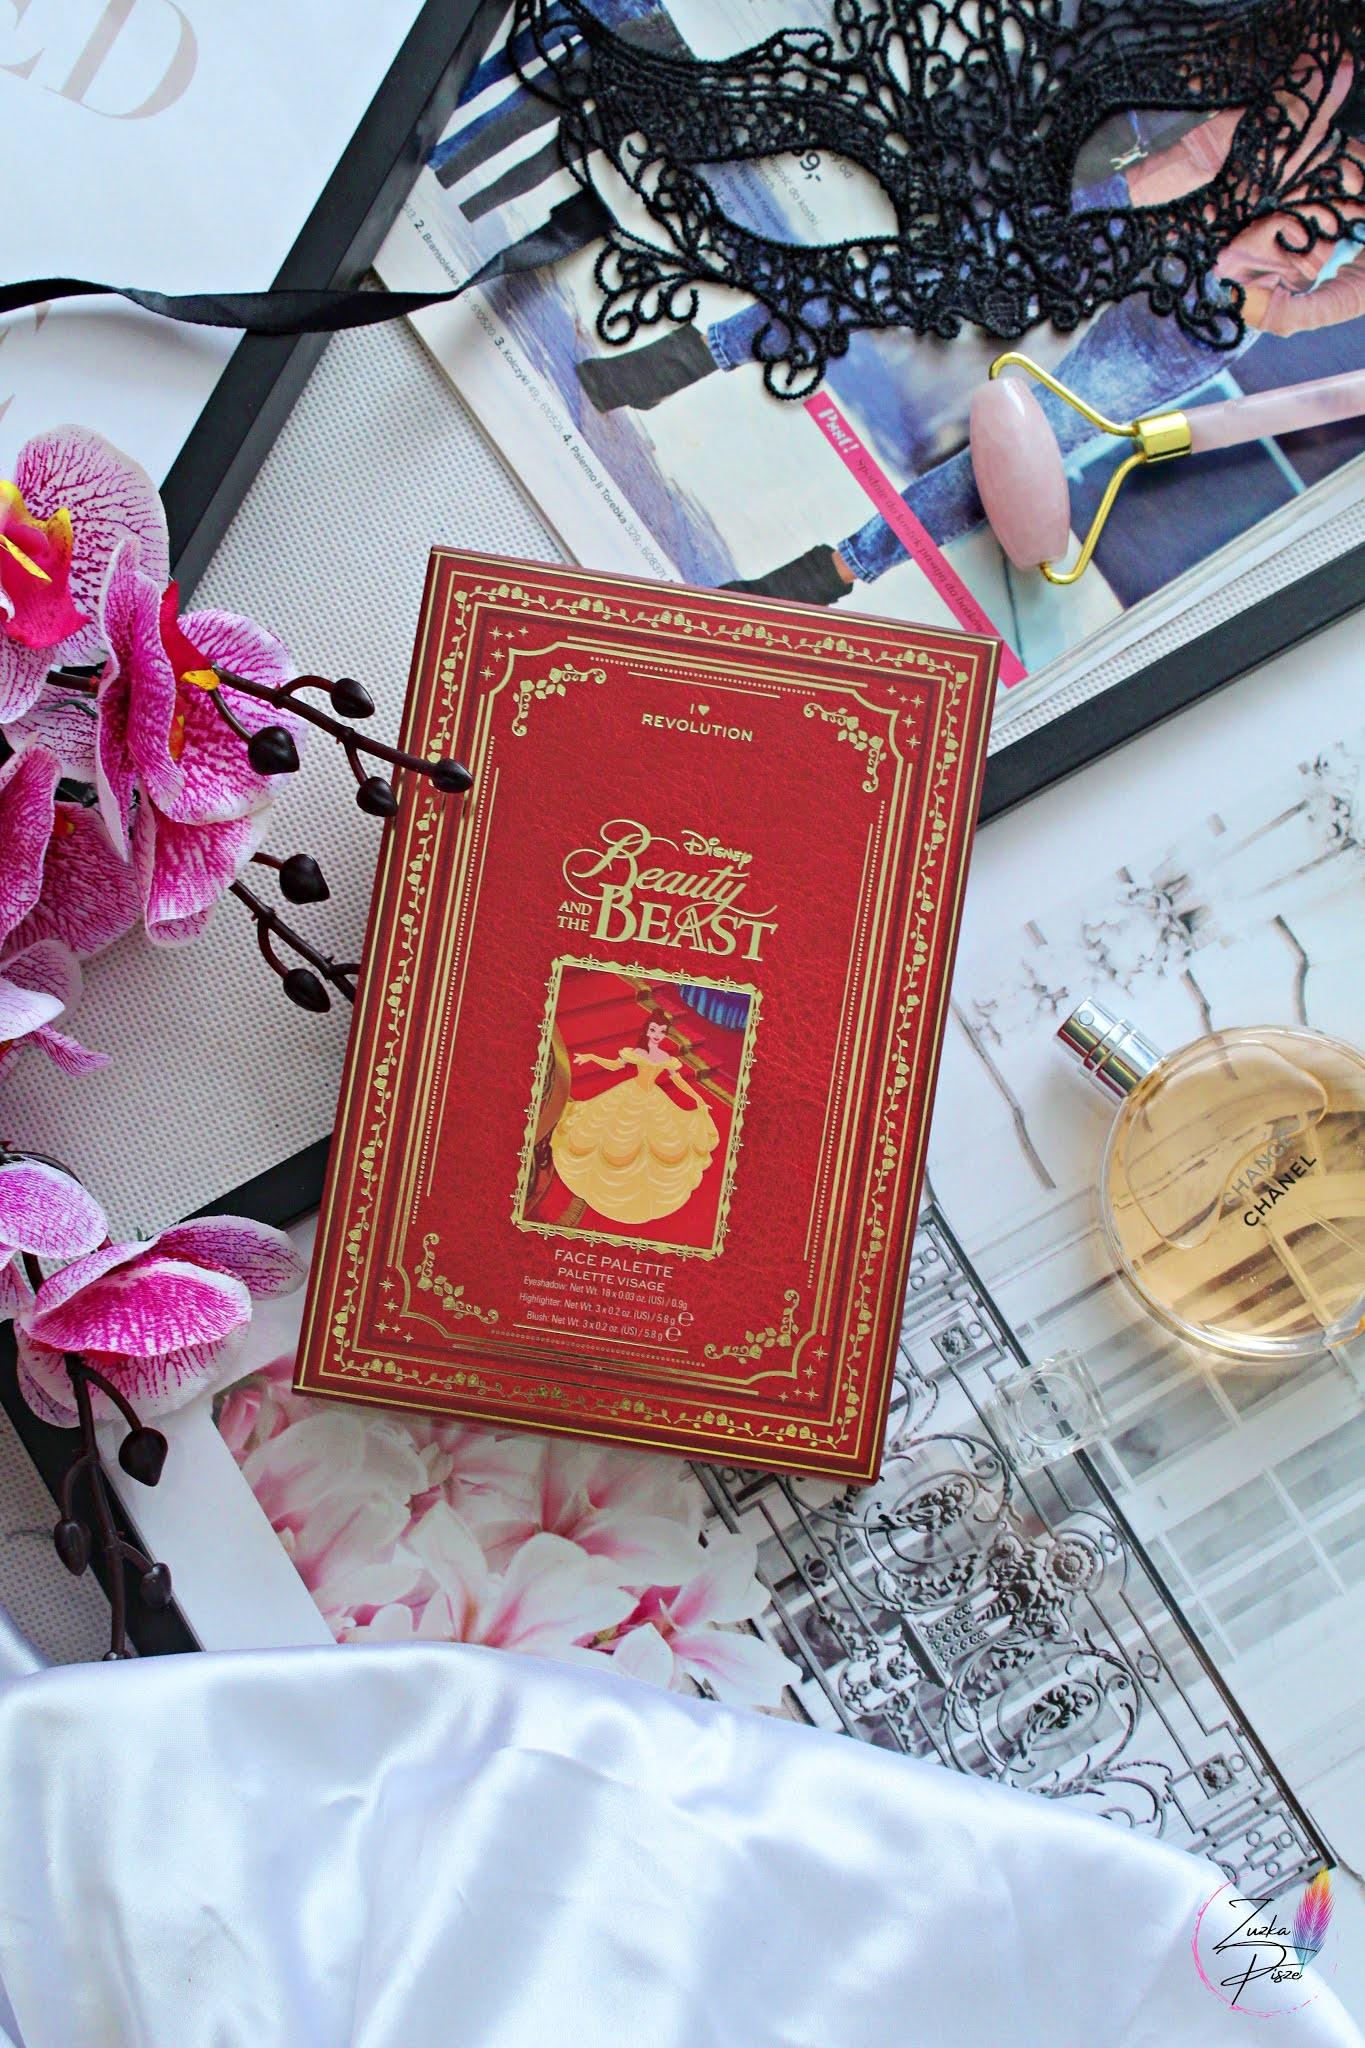 I Heart Revolution Beauty and the Beast Disney Storybook -  paletka do całej twarzy